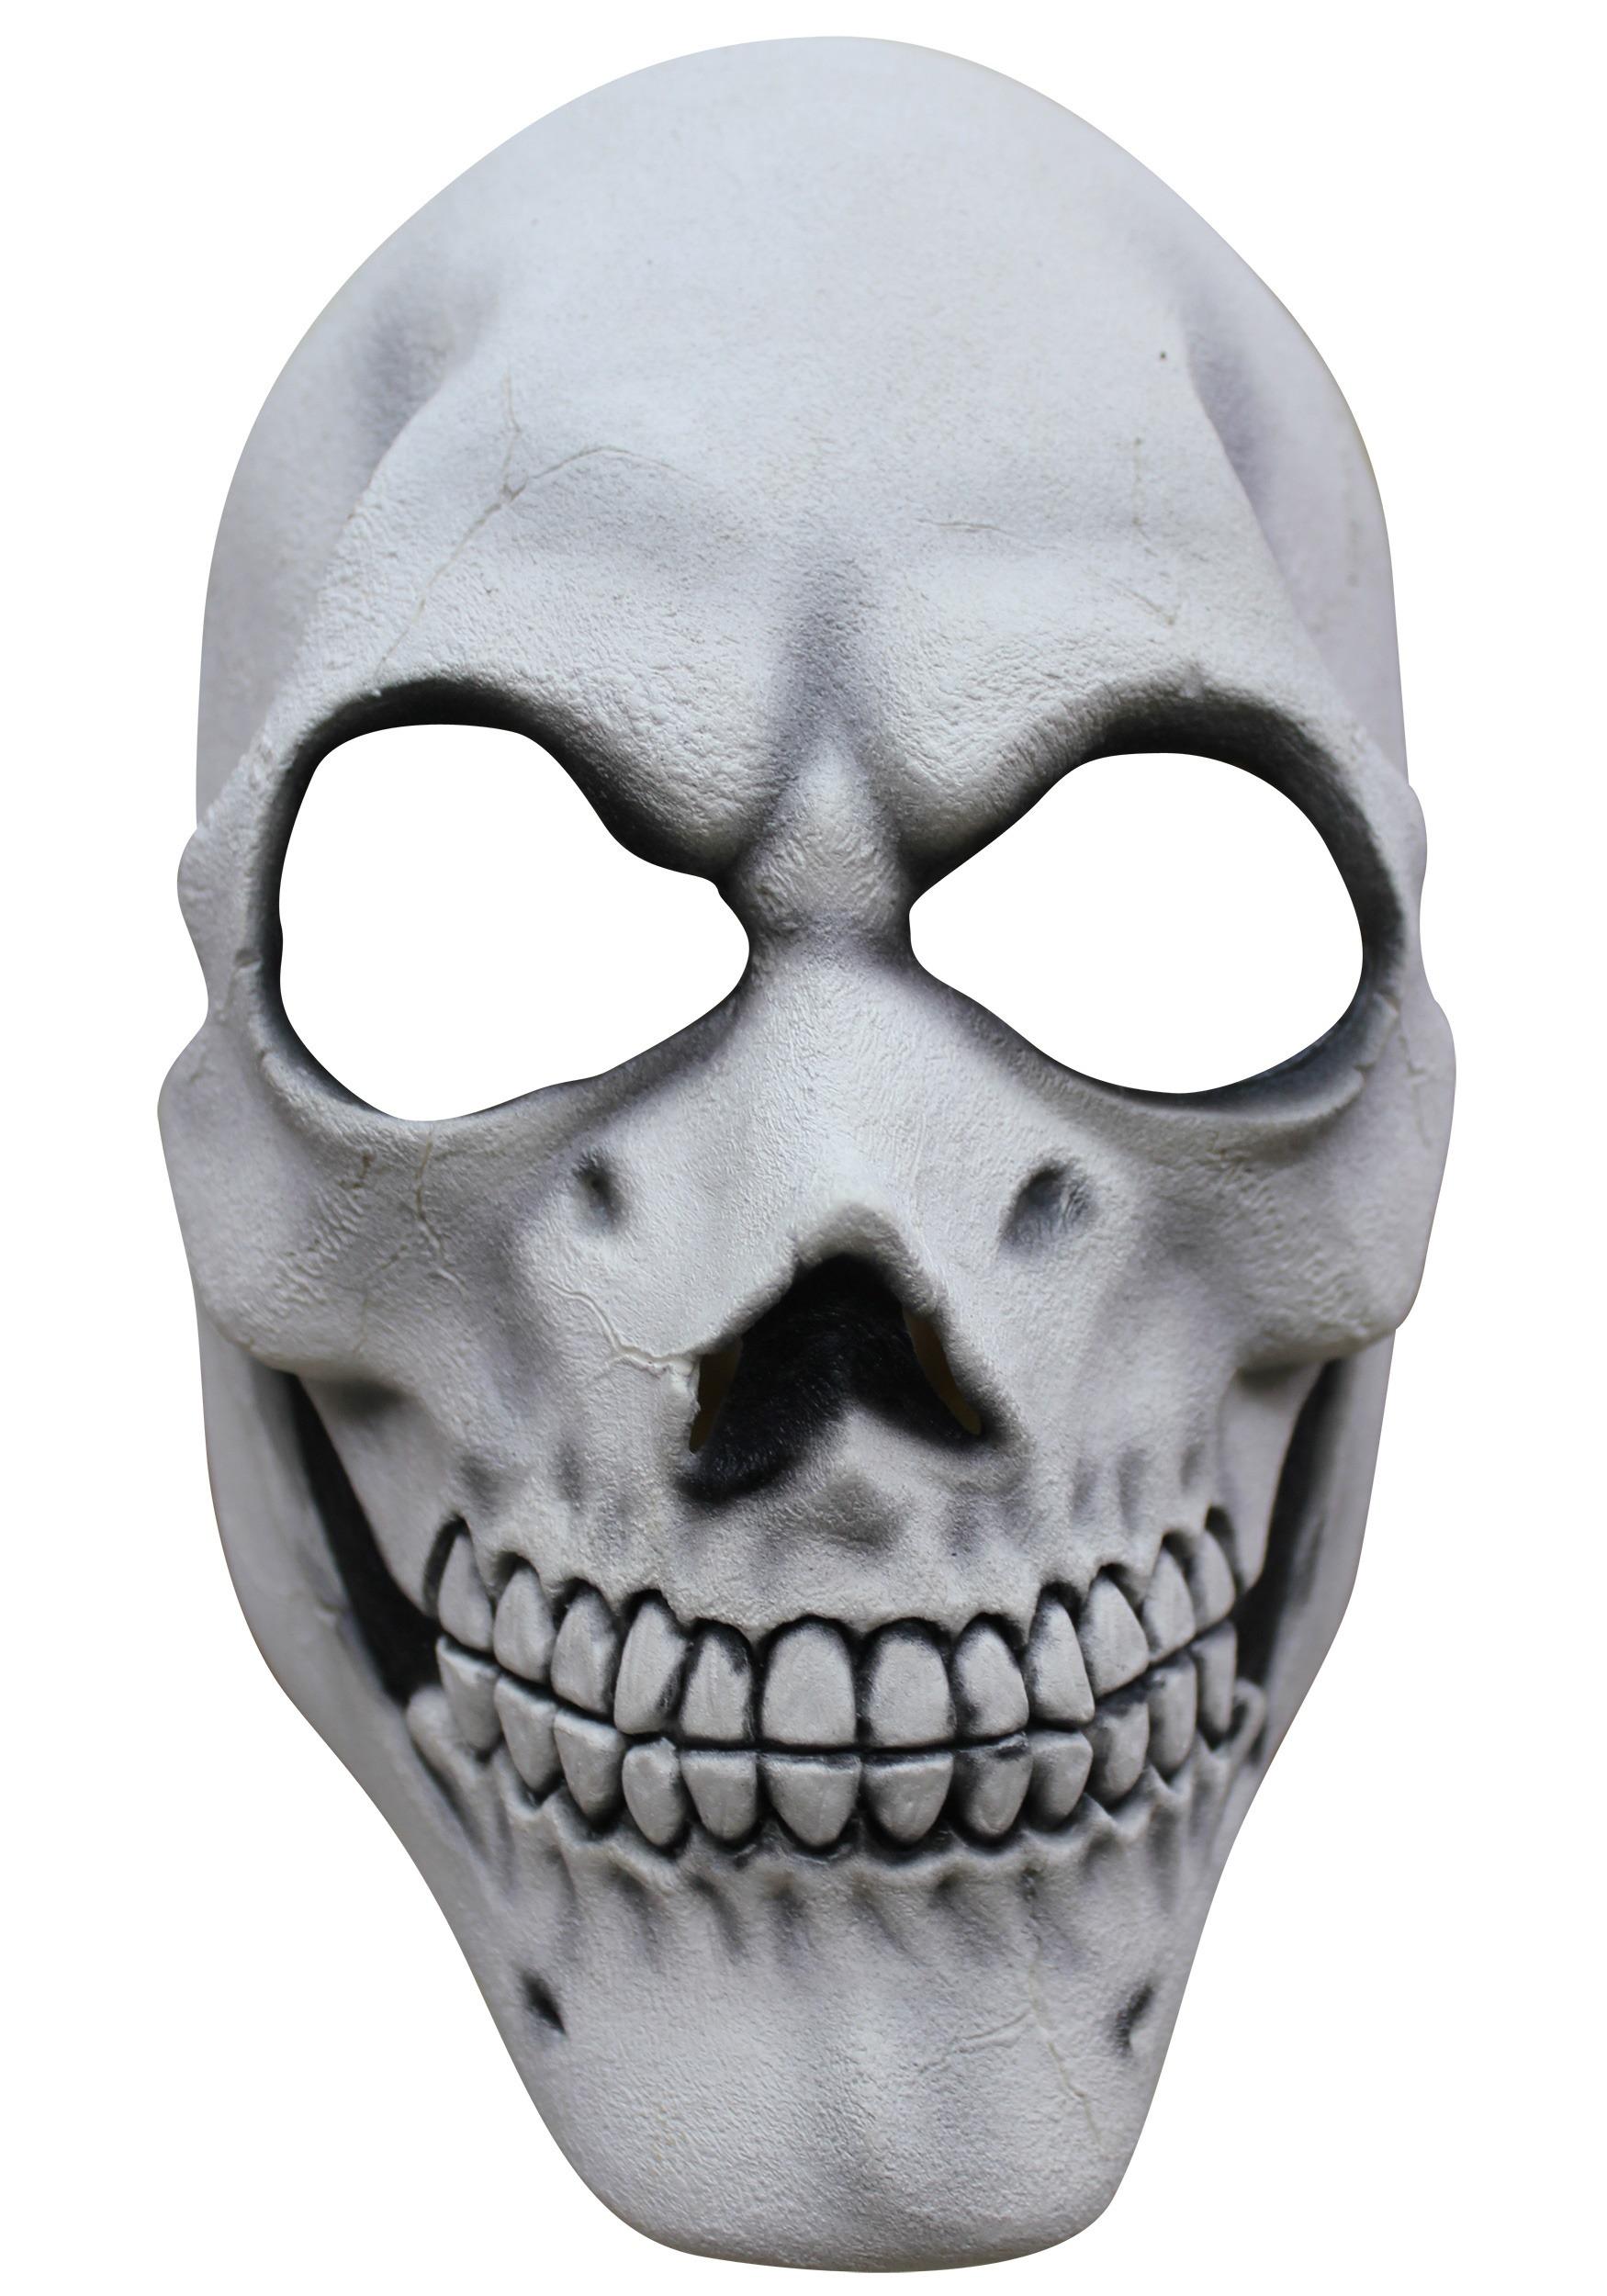 Uncategorized Skeleton Mask For Kids adult simple skull mask